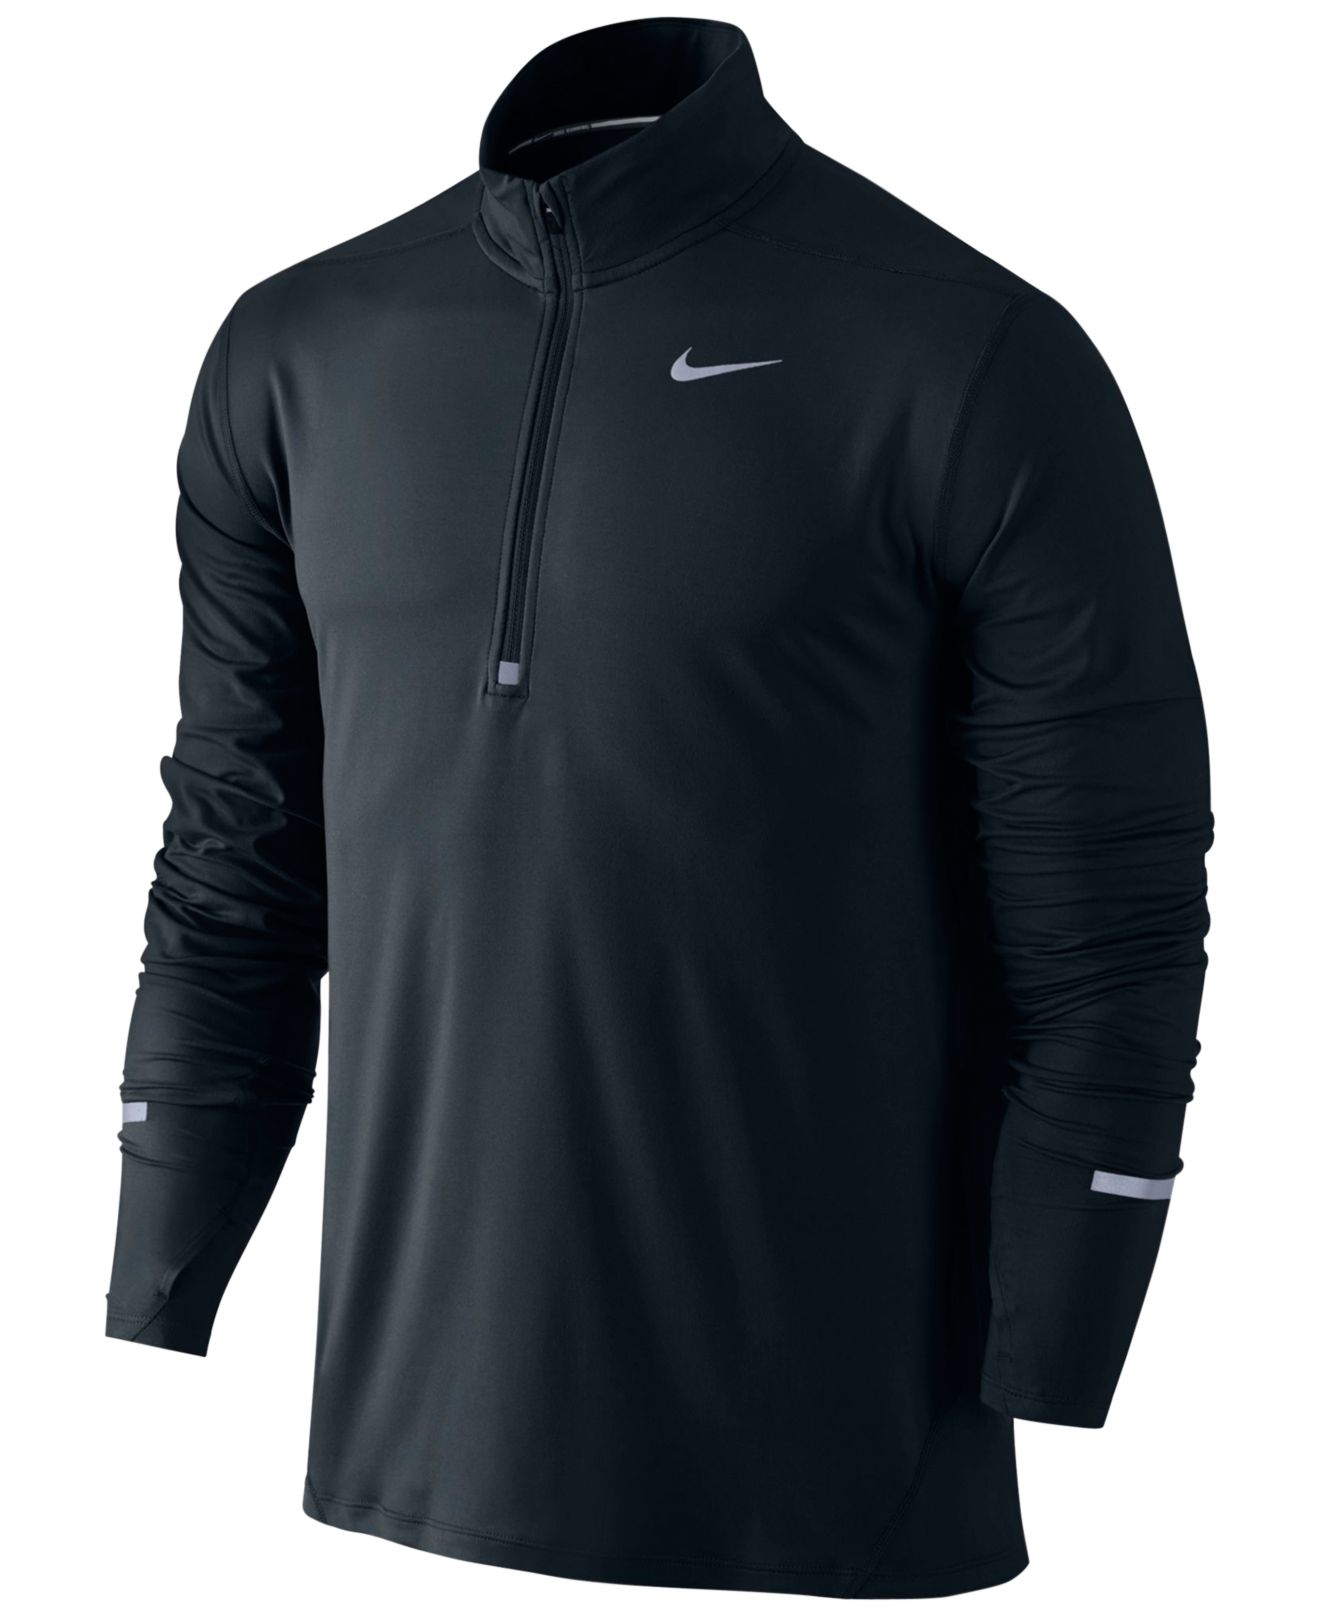 Nike Men 39 S Element Dri Fit Half Zip Running Shirt In Black